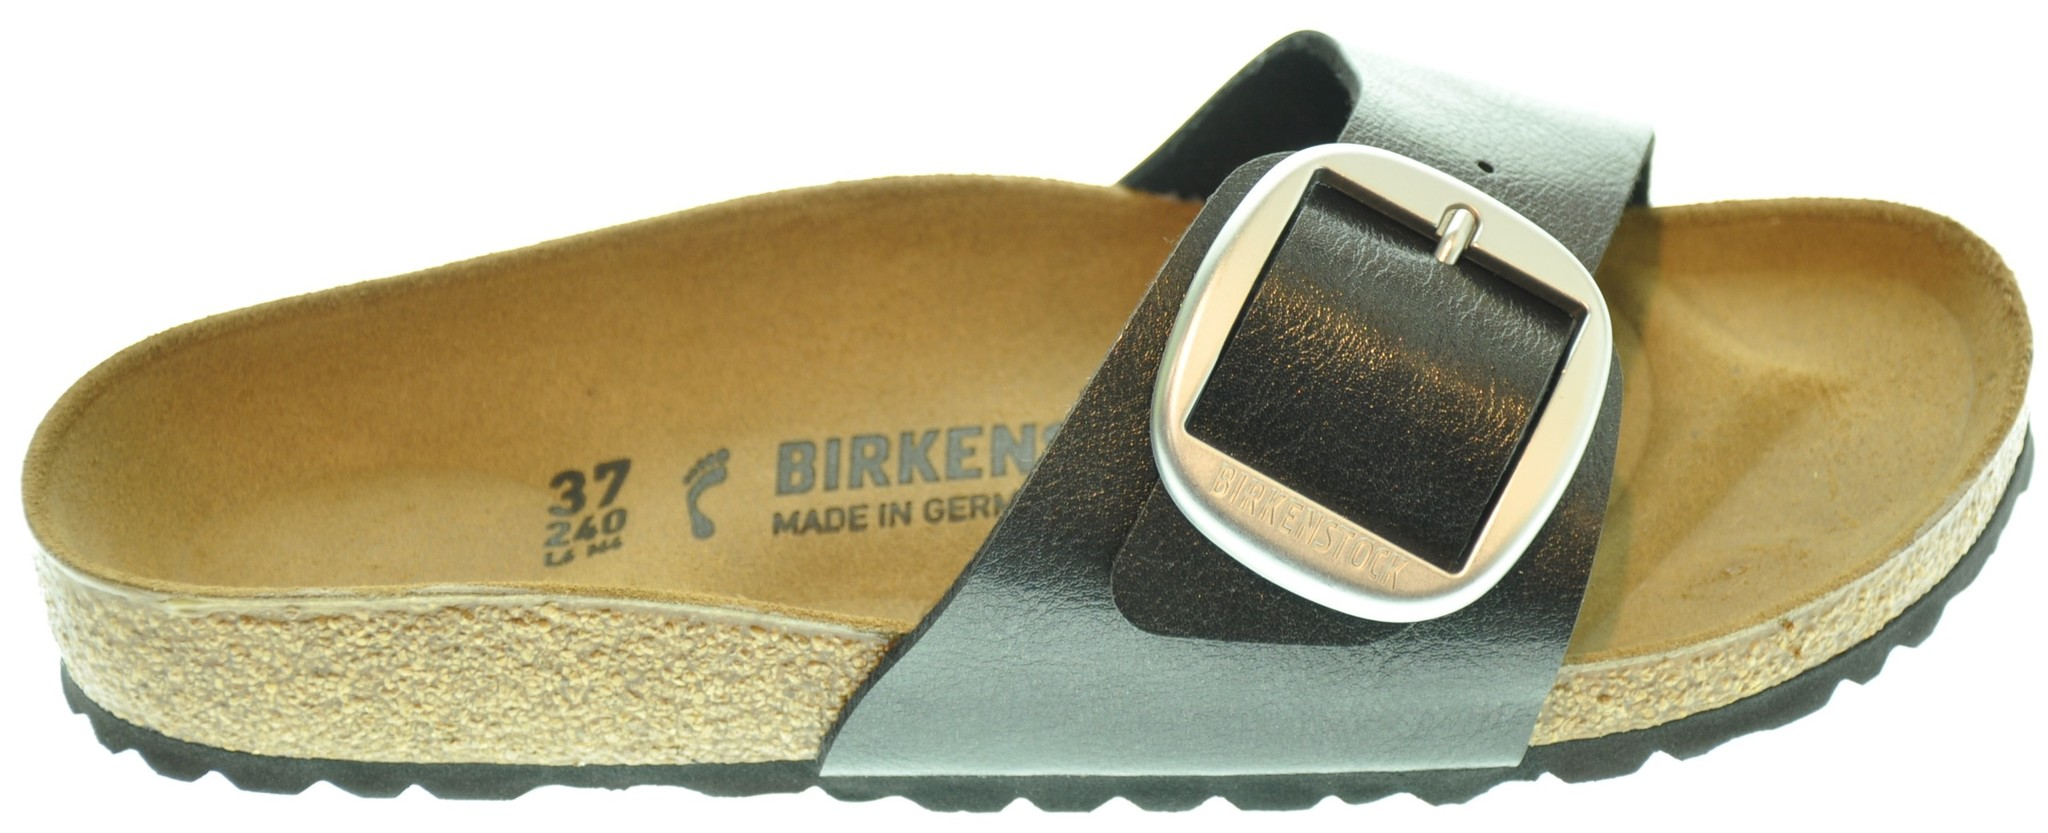 Birkenstock Birkenstock Slipper (36 t/m 41) 201BIR08